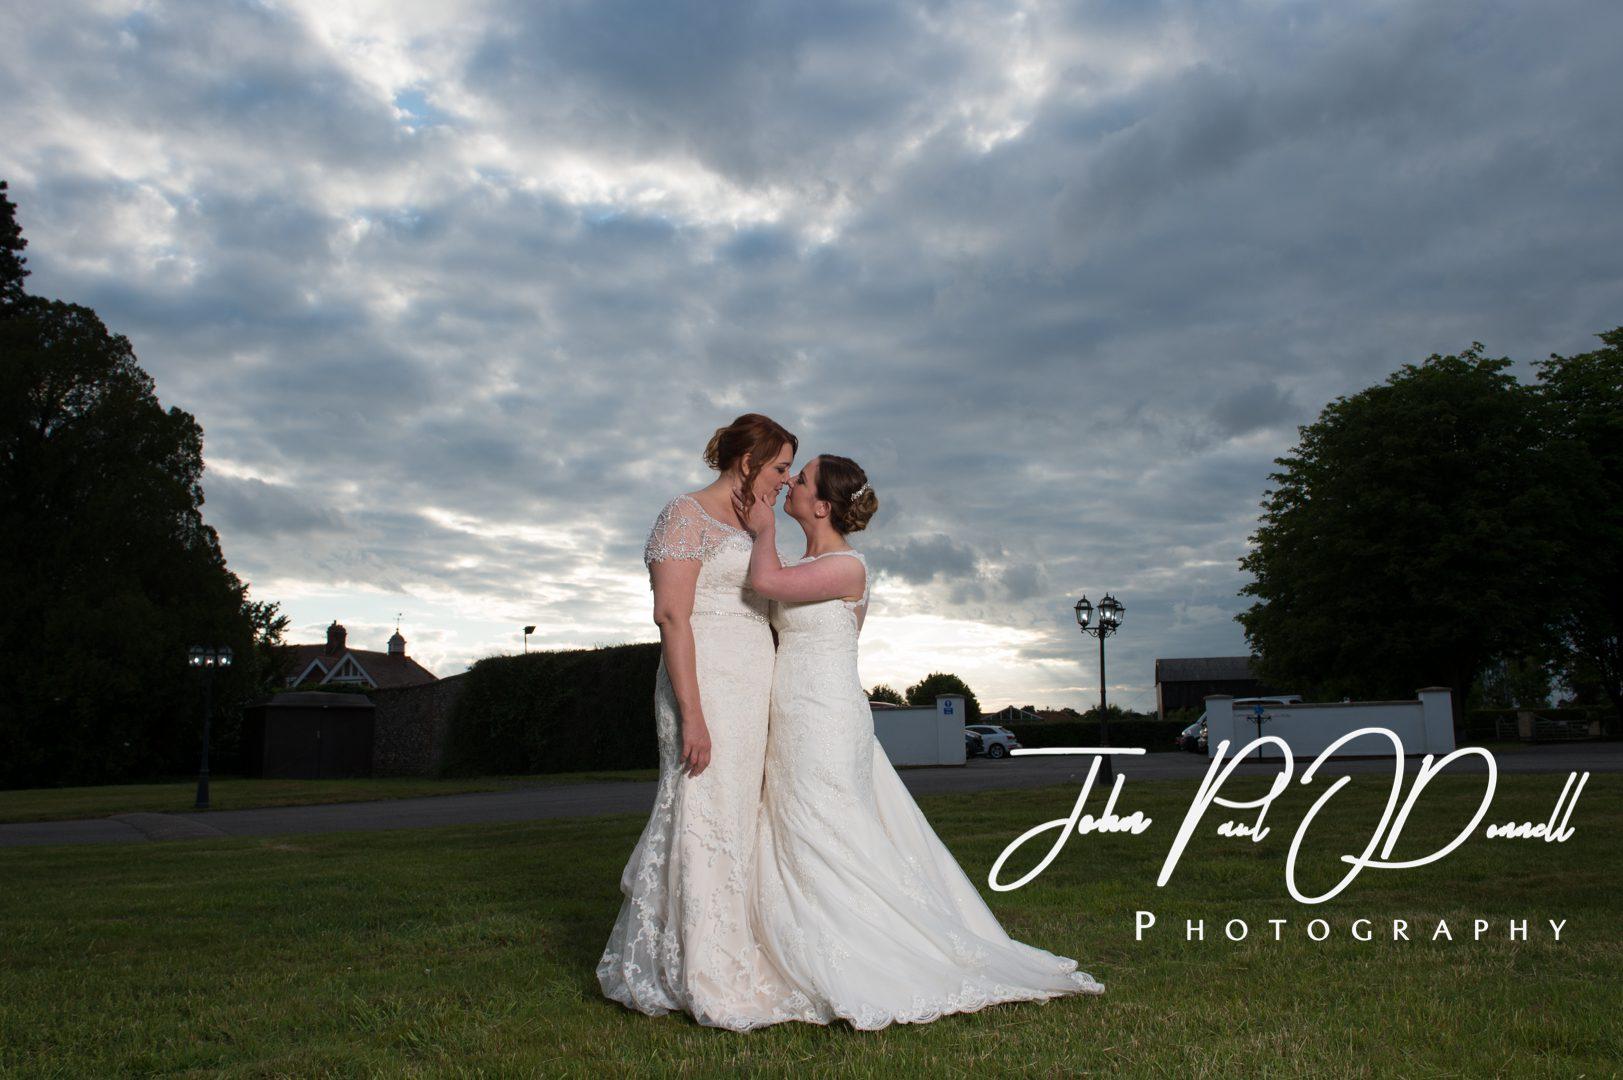 Danielle and Rebeccas wedding at Swynford Manor